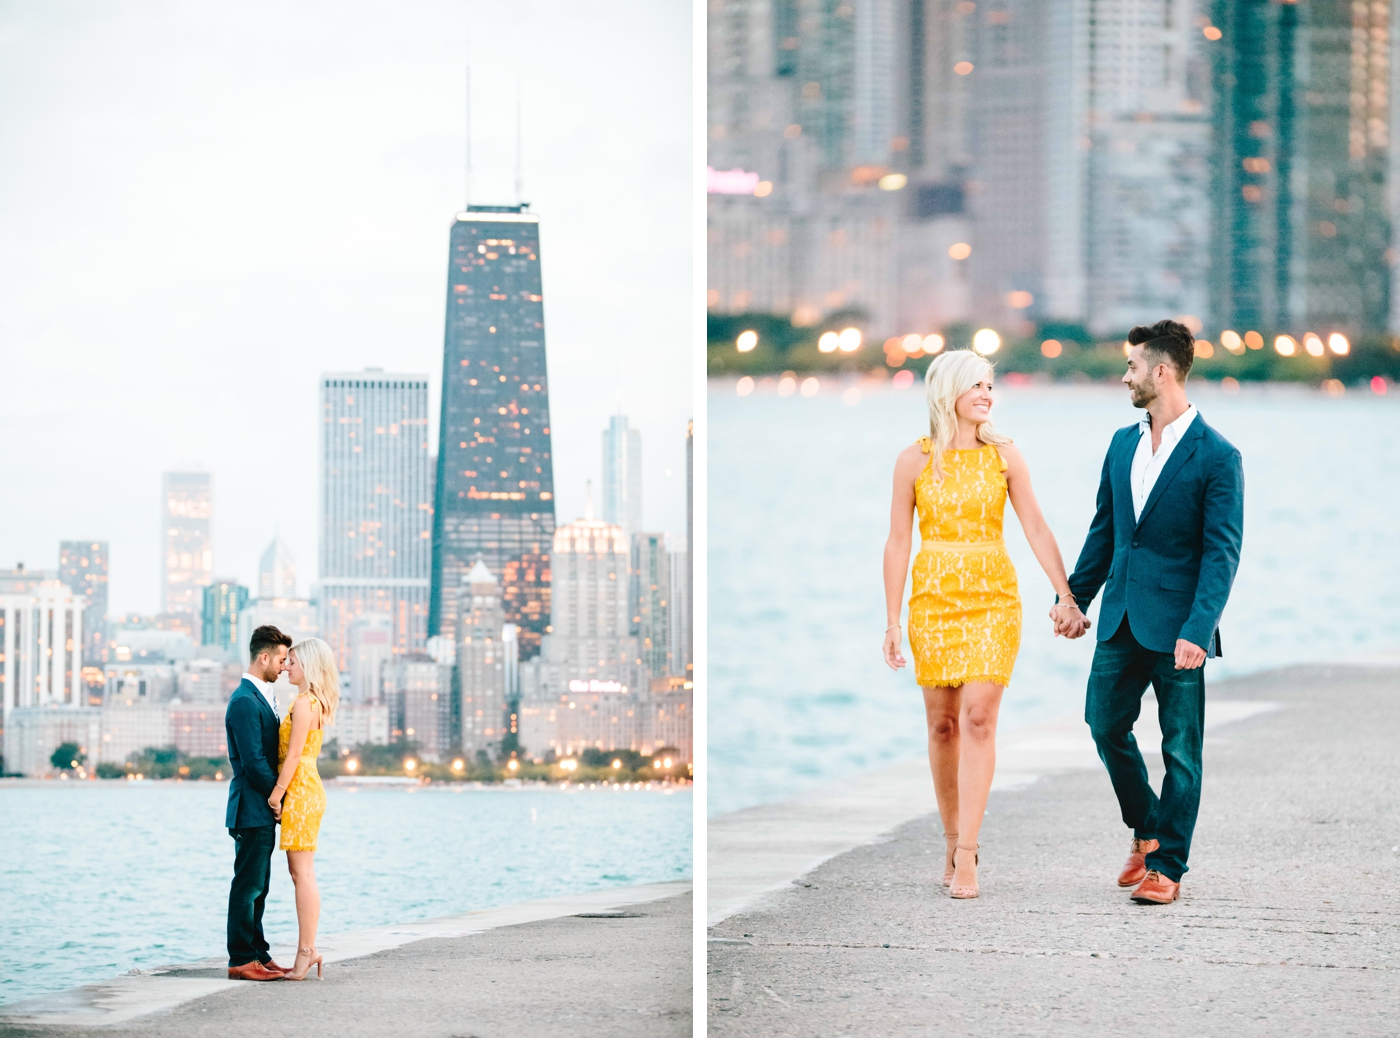 chicago-fine-art-wedding-photography-jasonbrittany16